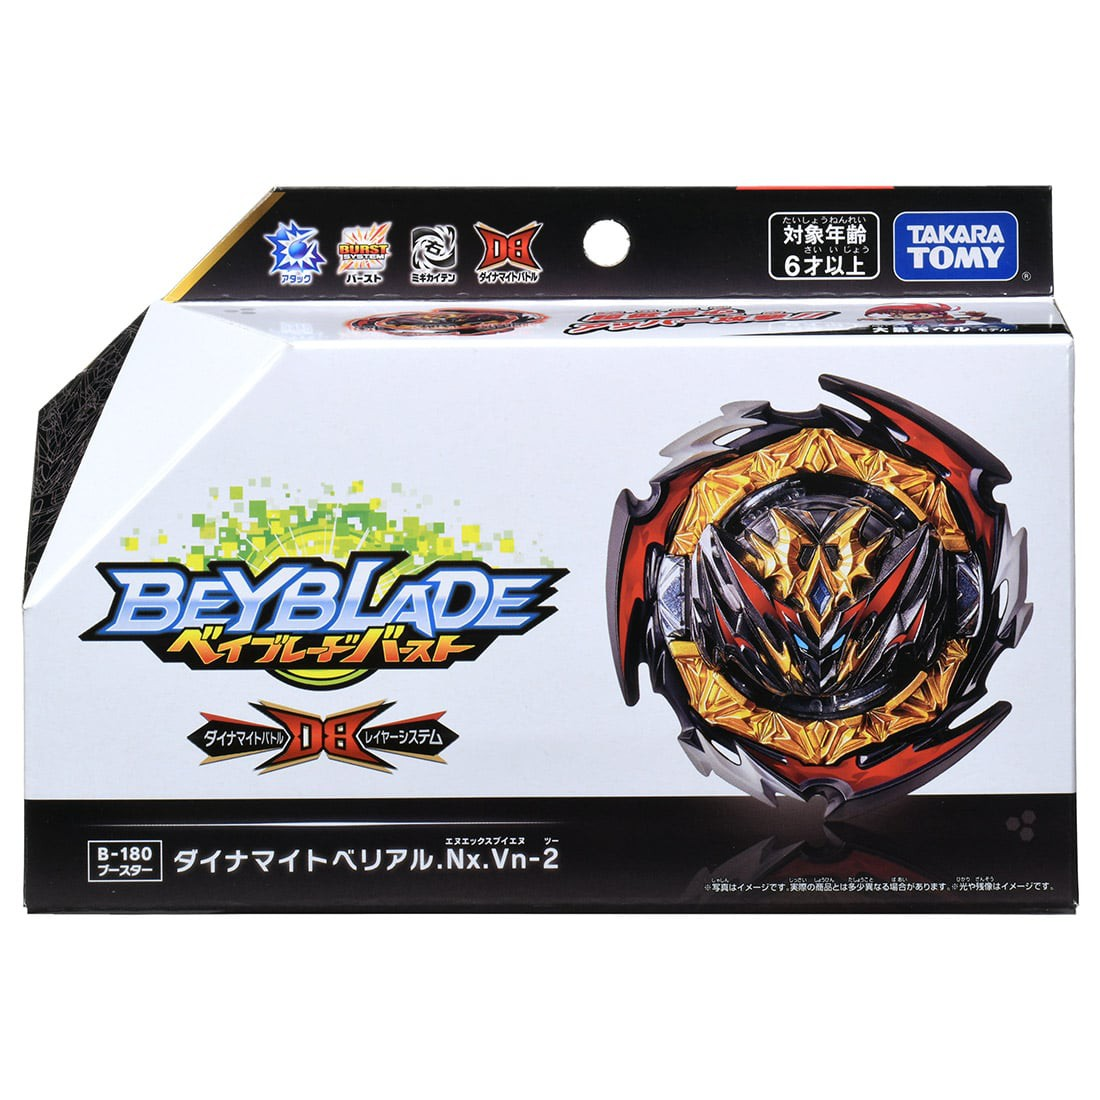 Takara Tomy Beyblade Burst B180 Booster Dynamite Belial .Nexus .Venture-2 B163 beyblade B172 Booster World Spriggan.U' 2B